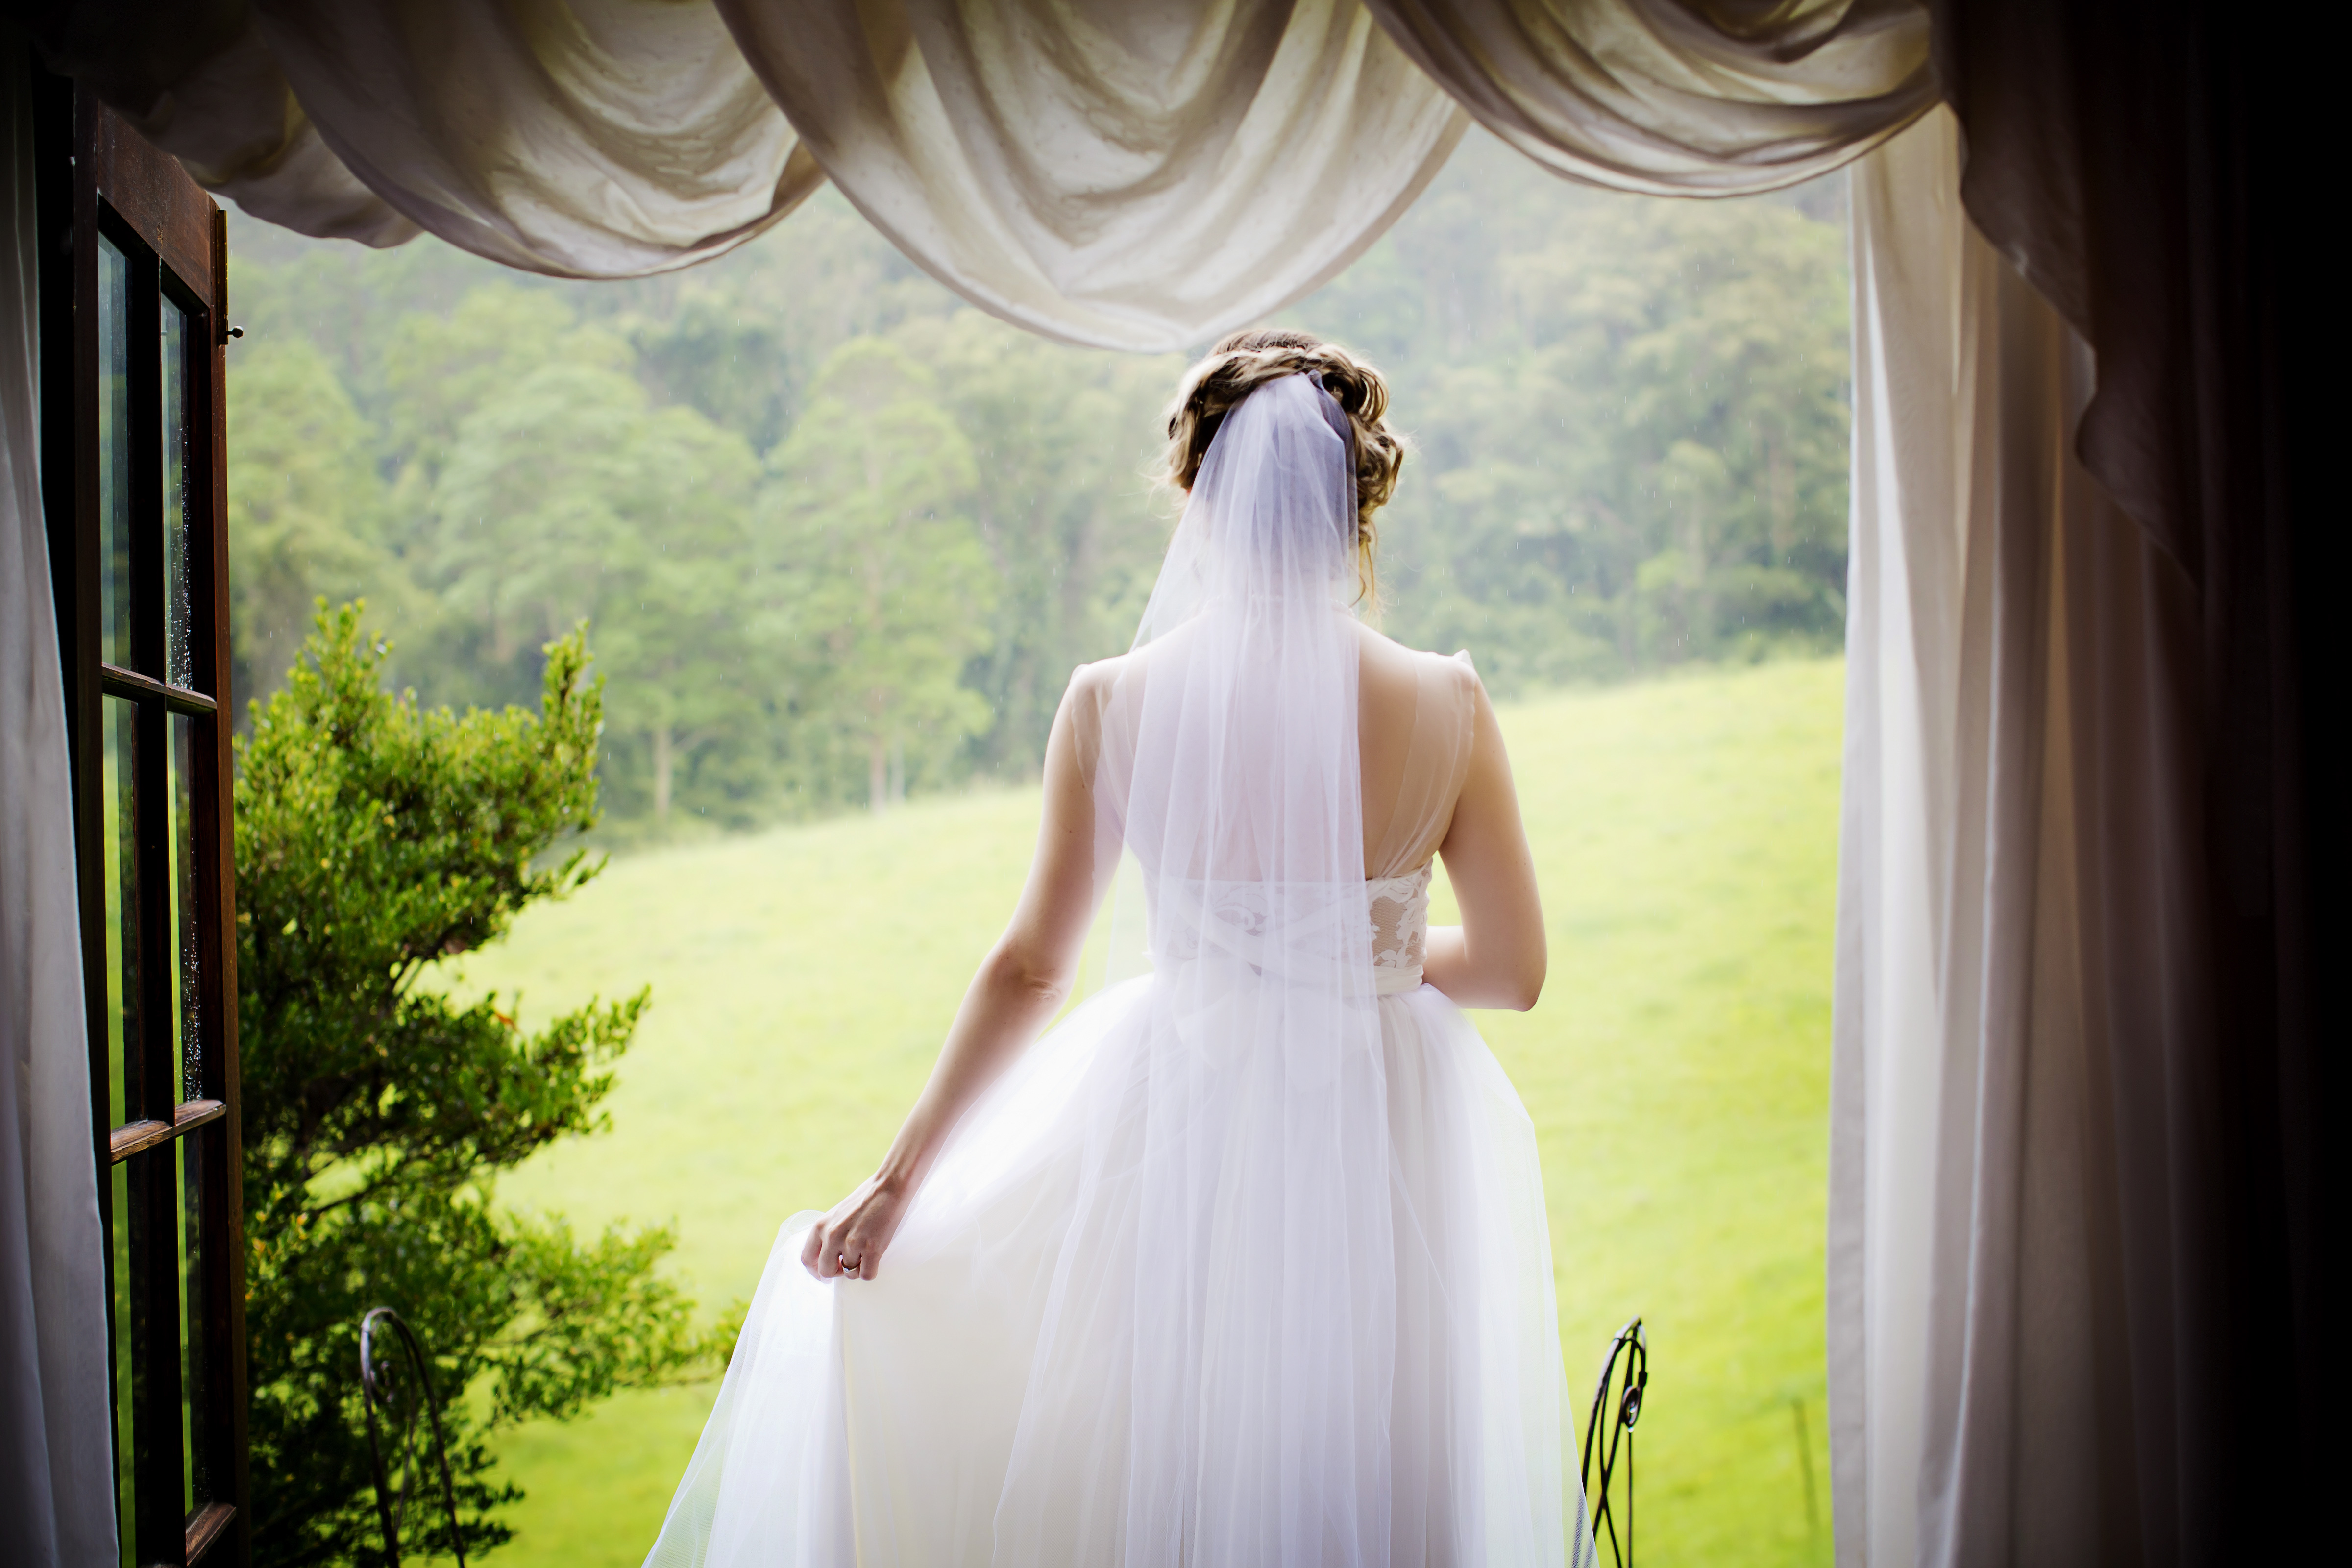 Small wedding venues in Coffs Harbour Hinterland Bride at Friday Creek Retreat